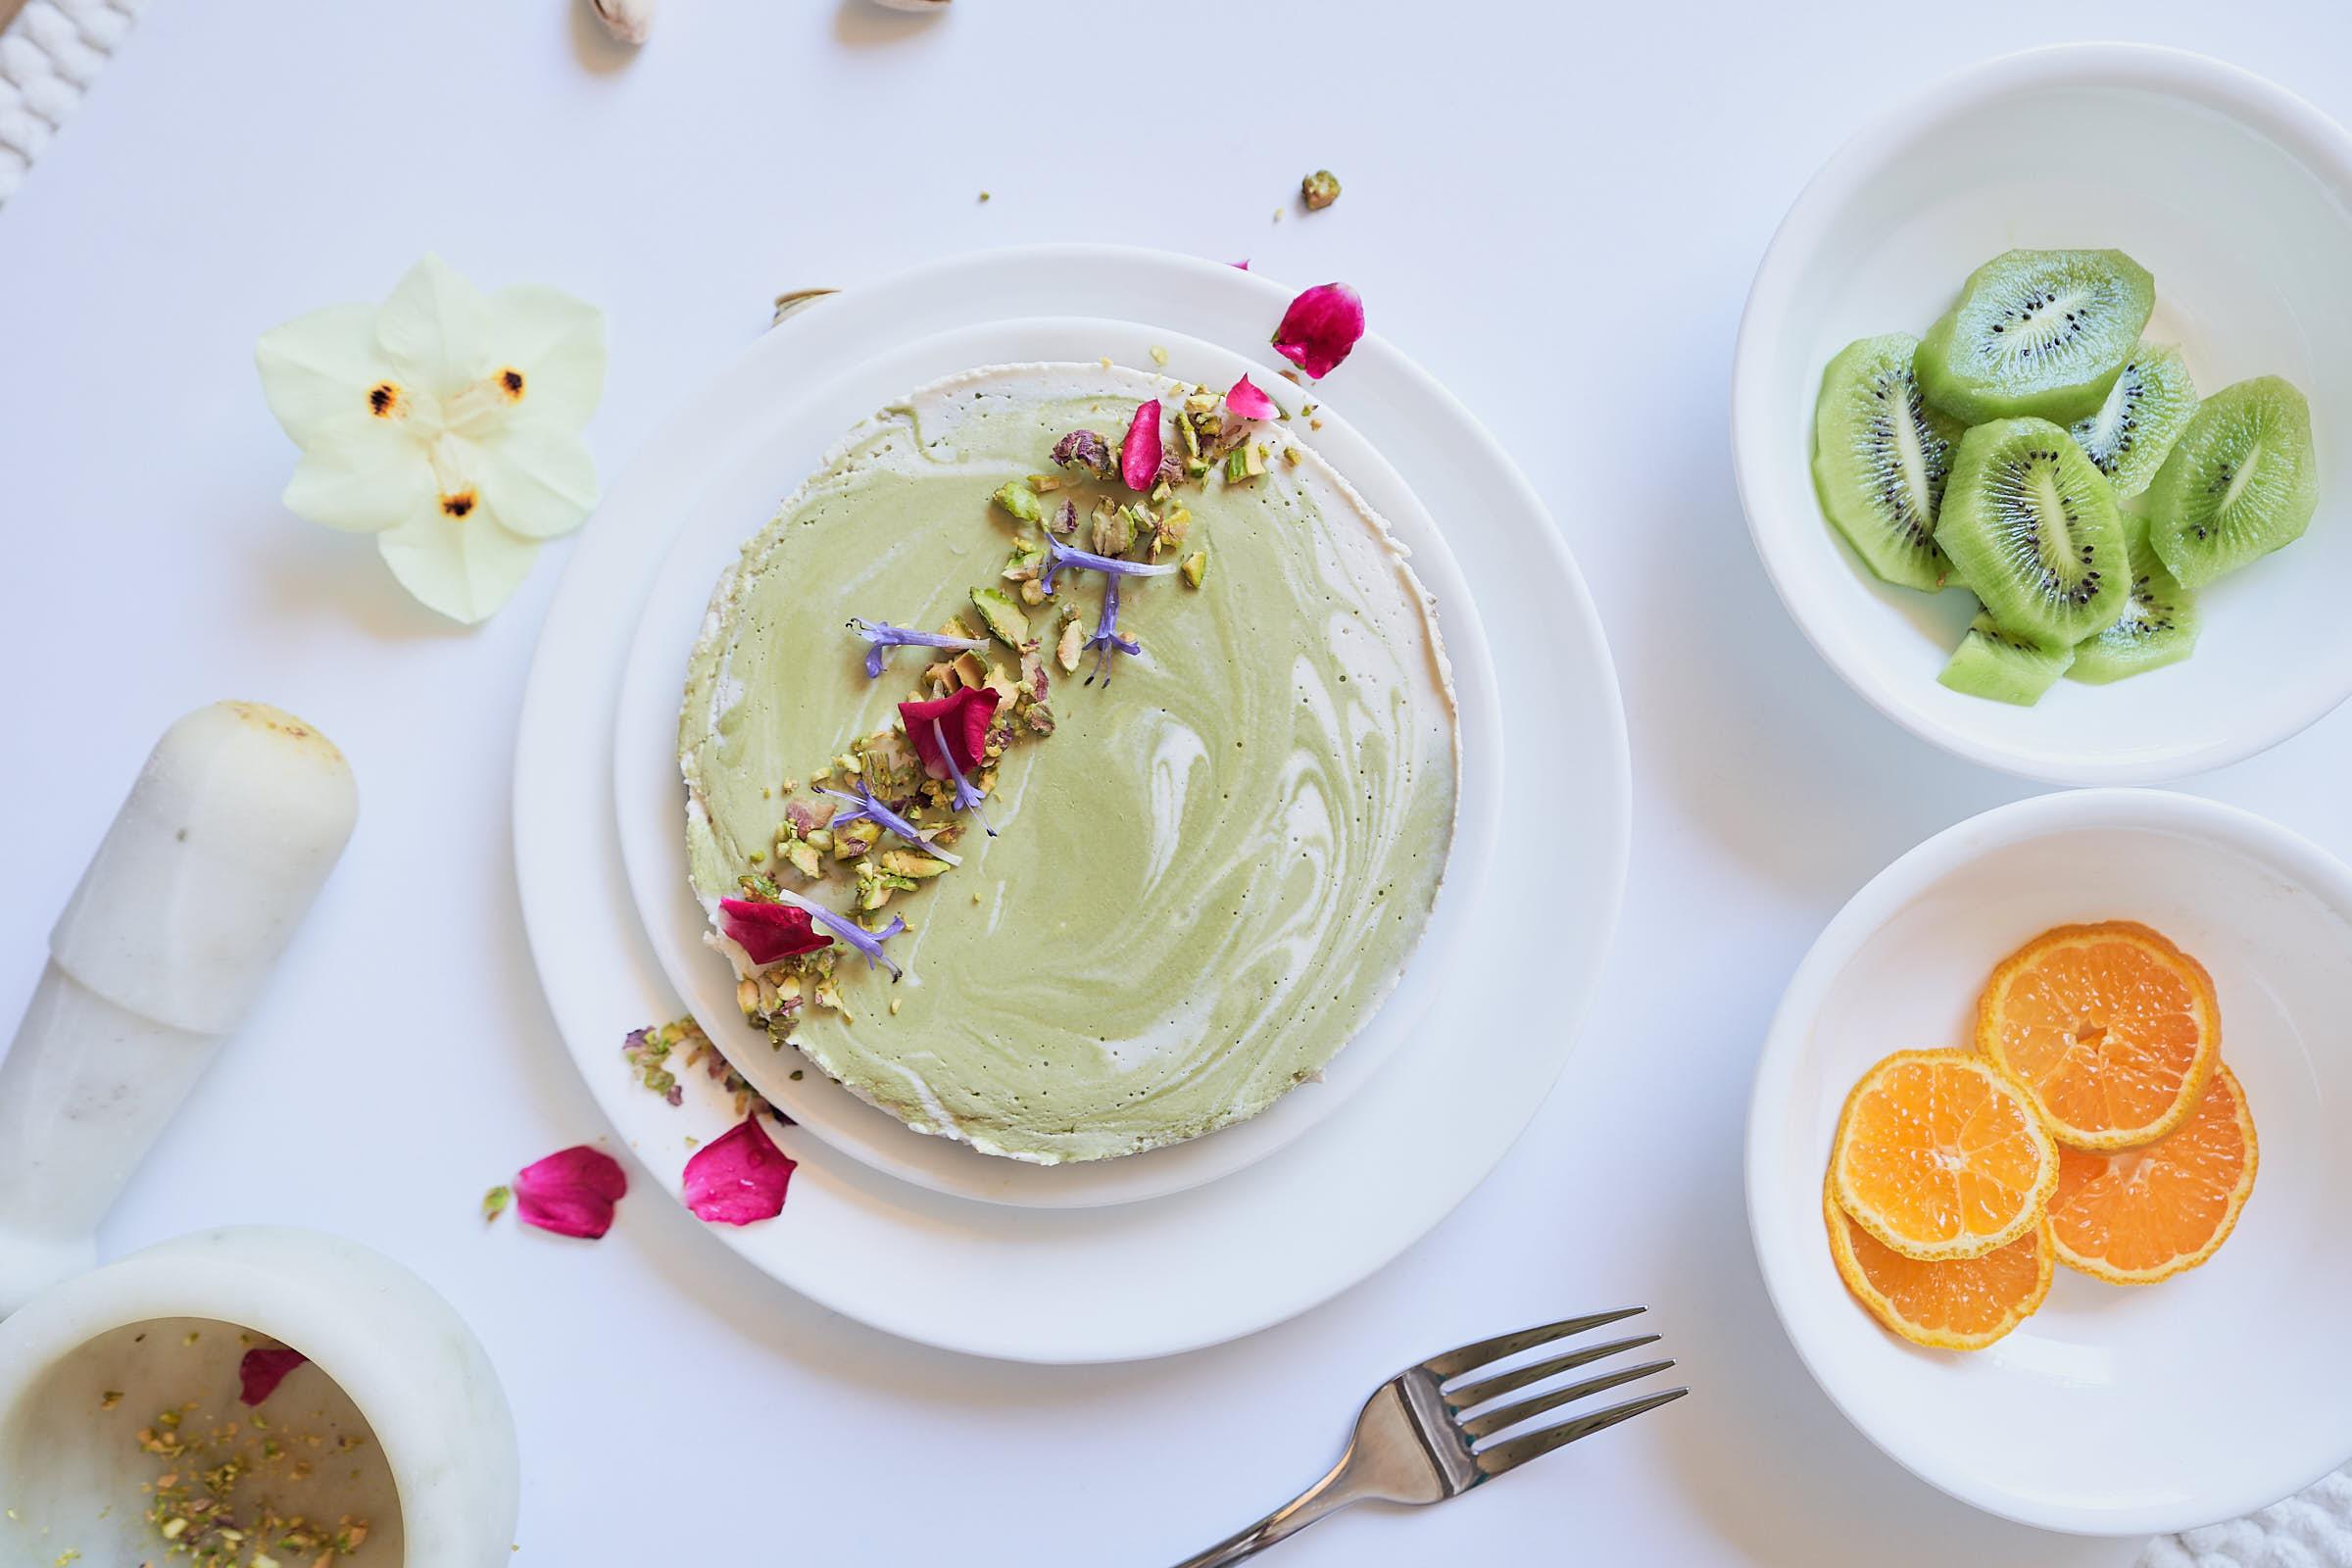 Pistachio Marble Cake Dessert Picture Afewgoodclicks